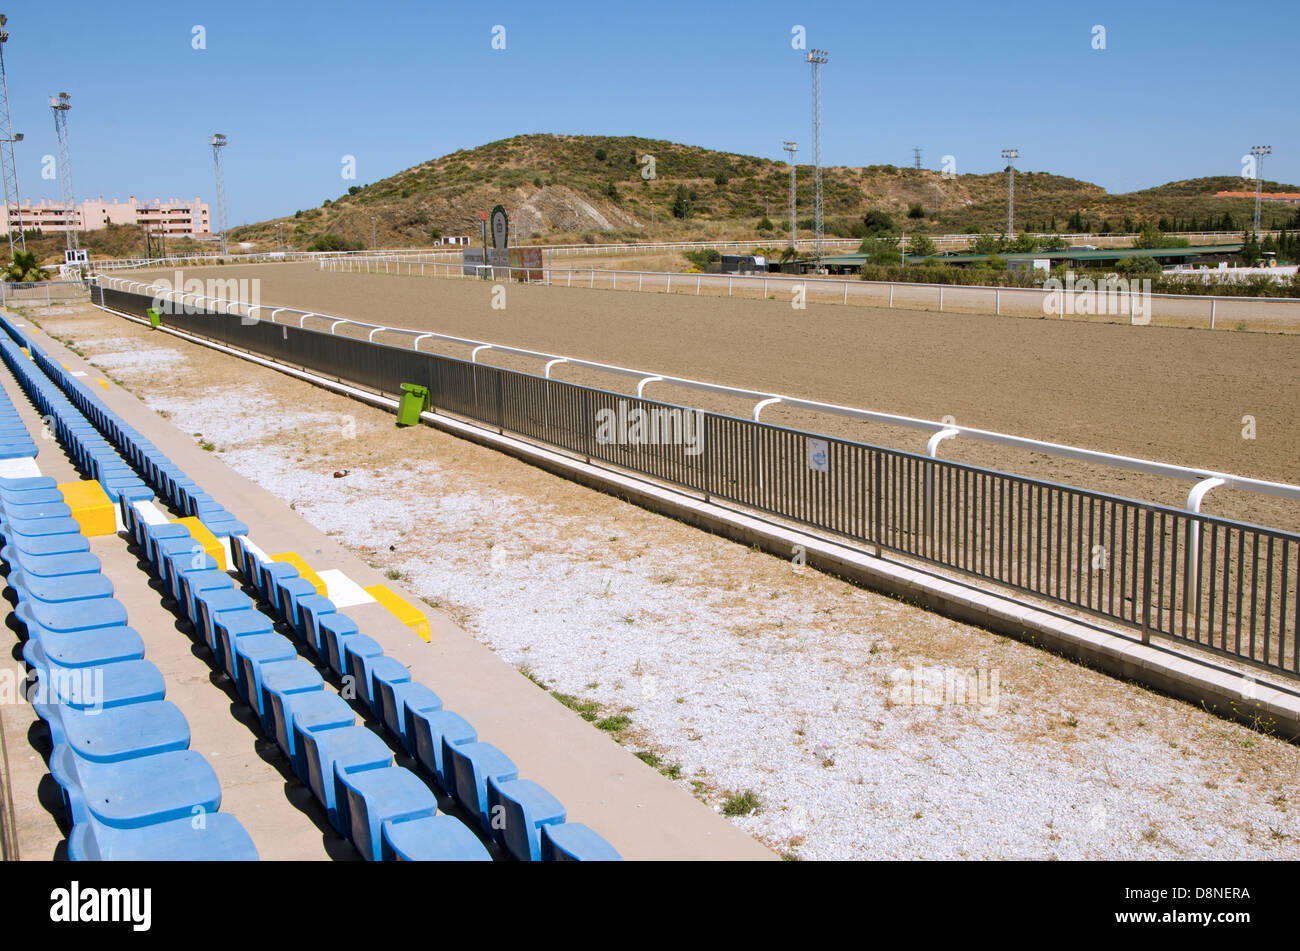 Fuengirola, Malaga, Spain - Stock Image